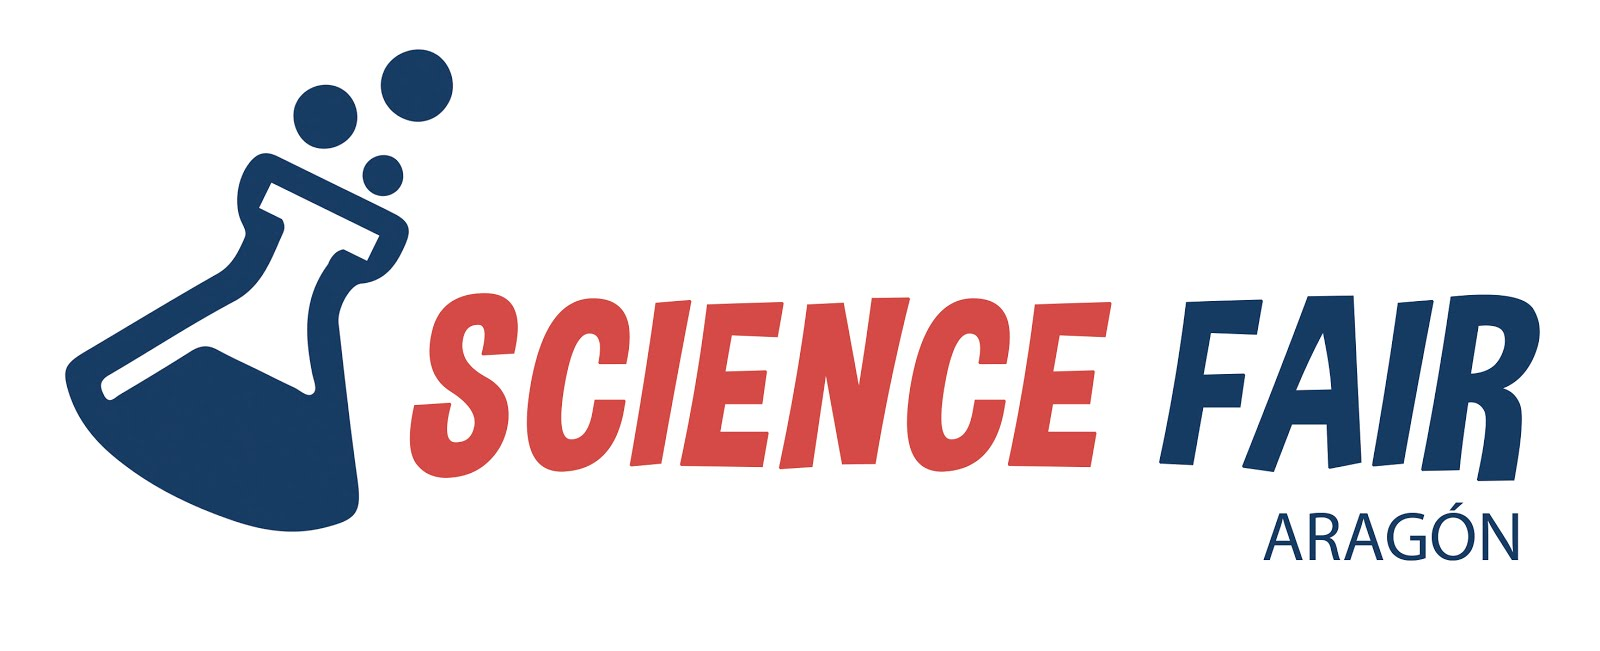 SCIENCE FAIR ARAGON